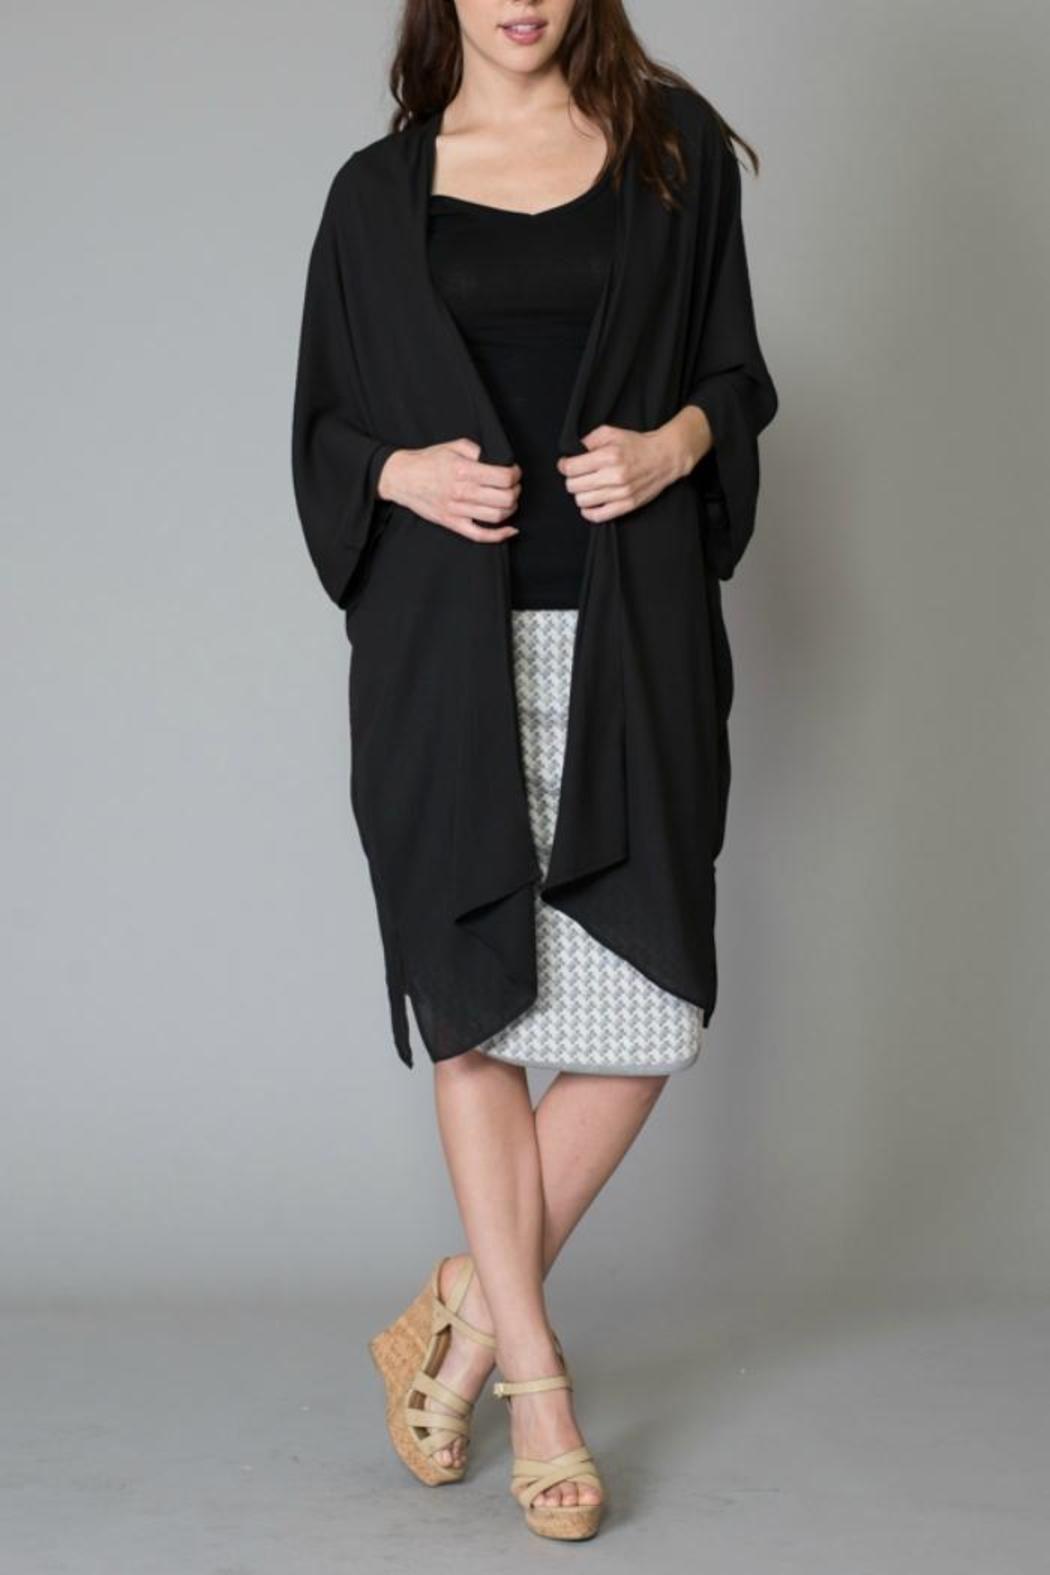 Glitz & Glam Boutique Sheer Cardigan | Sweater cardigan, Sleeve ...